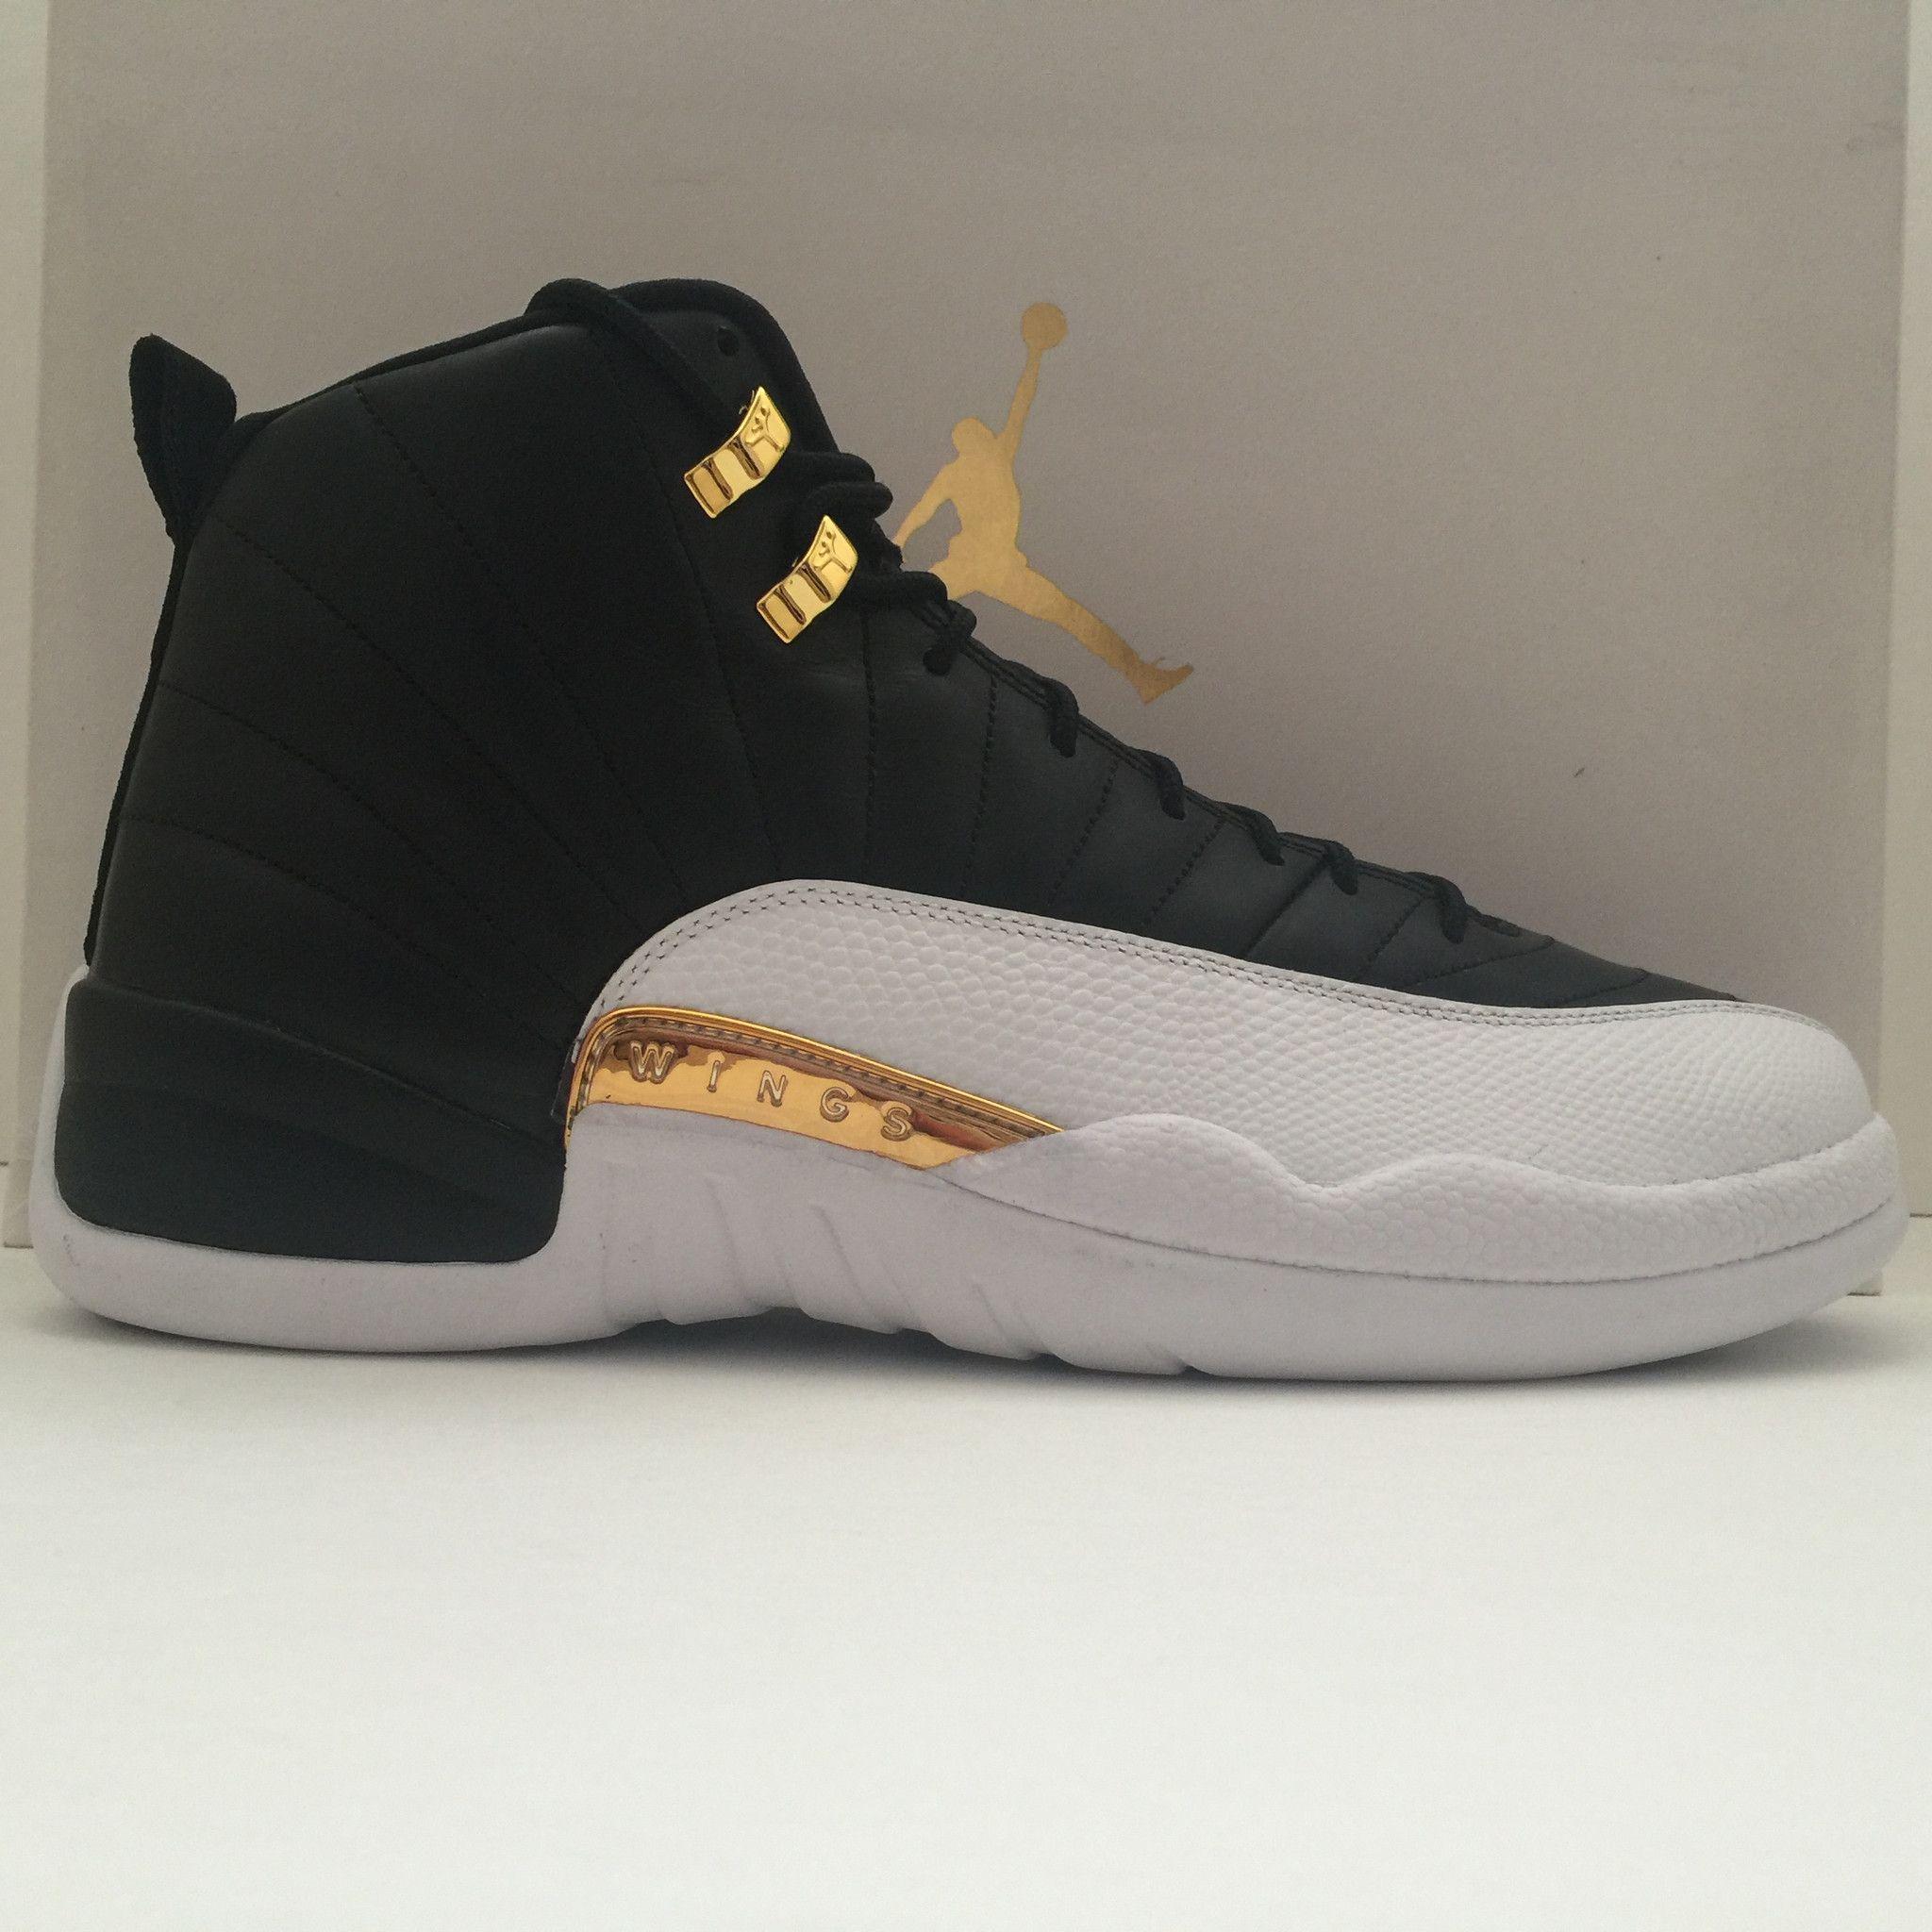 DS Nike Air Jordan 12 XII Retro Wings Size 11 | Sneakers